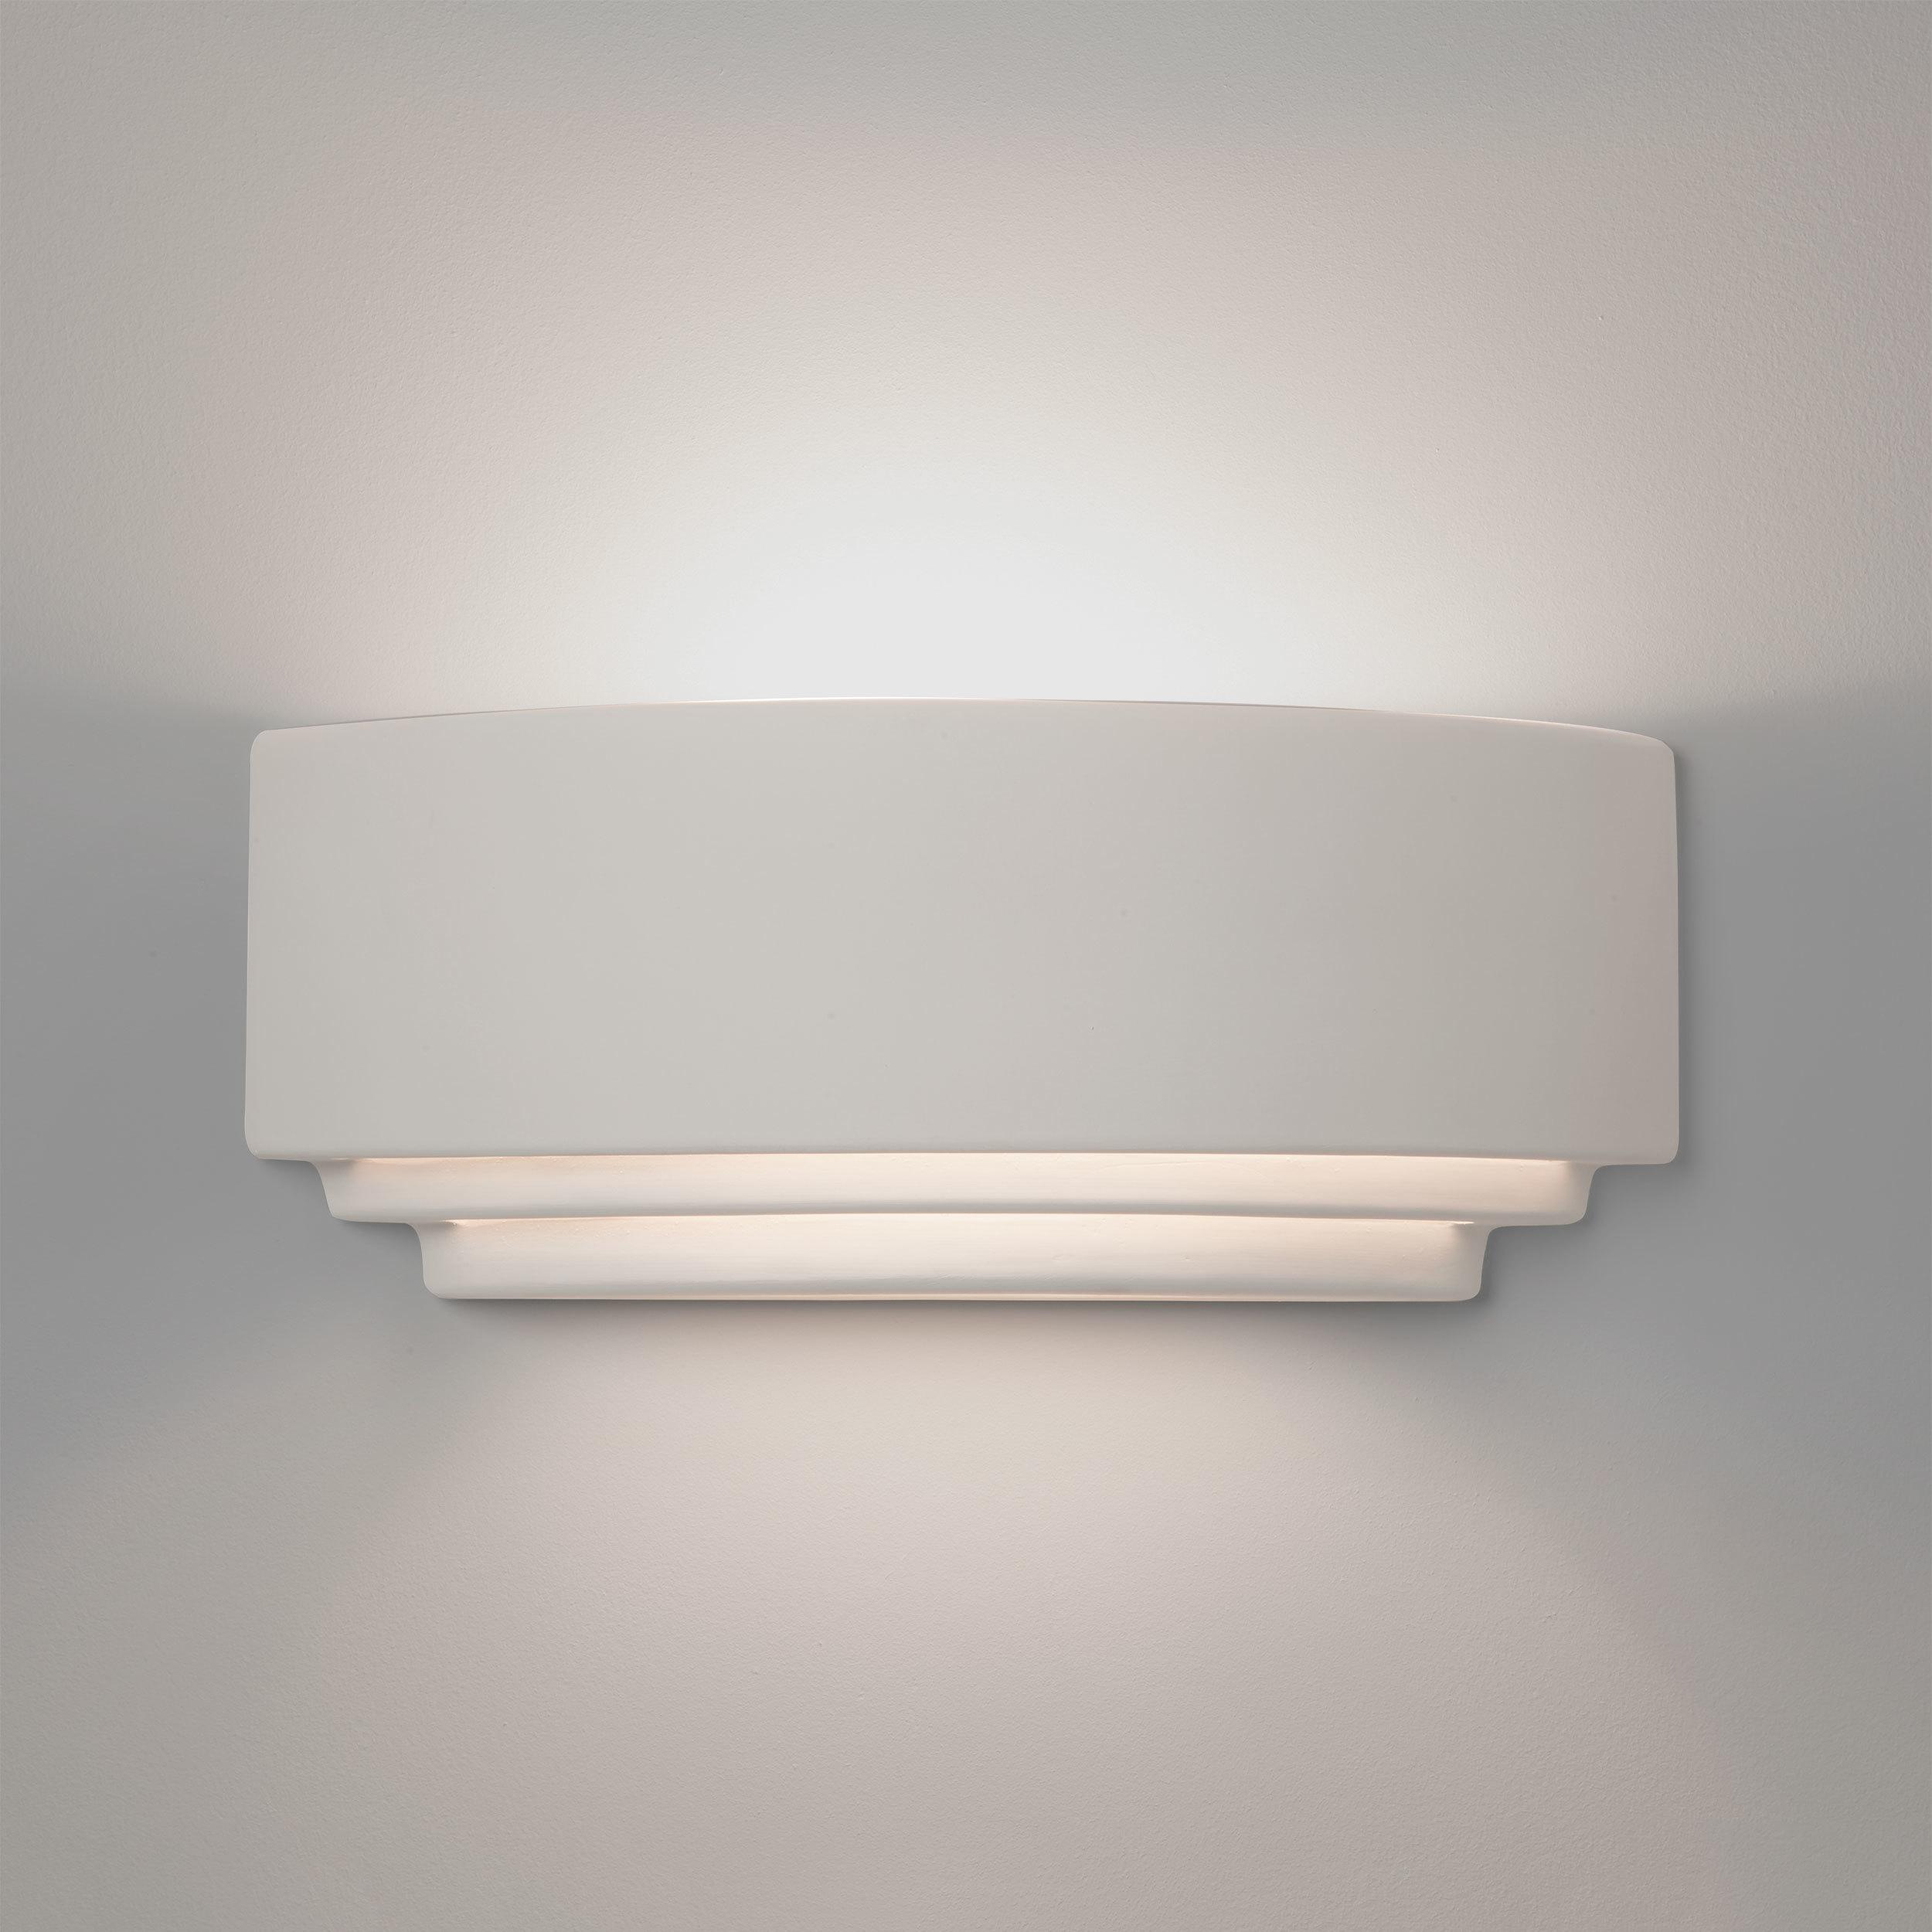 Настенный светильник Astro Amalfi 1079004 (7470), 1xE27x60W, белый, под покраску, керамика - фото 1